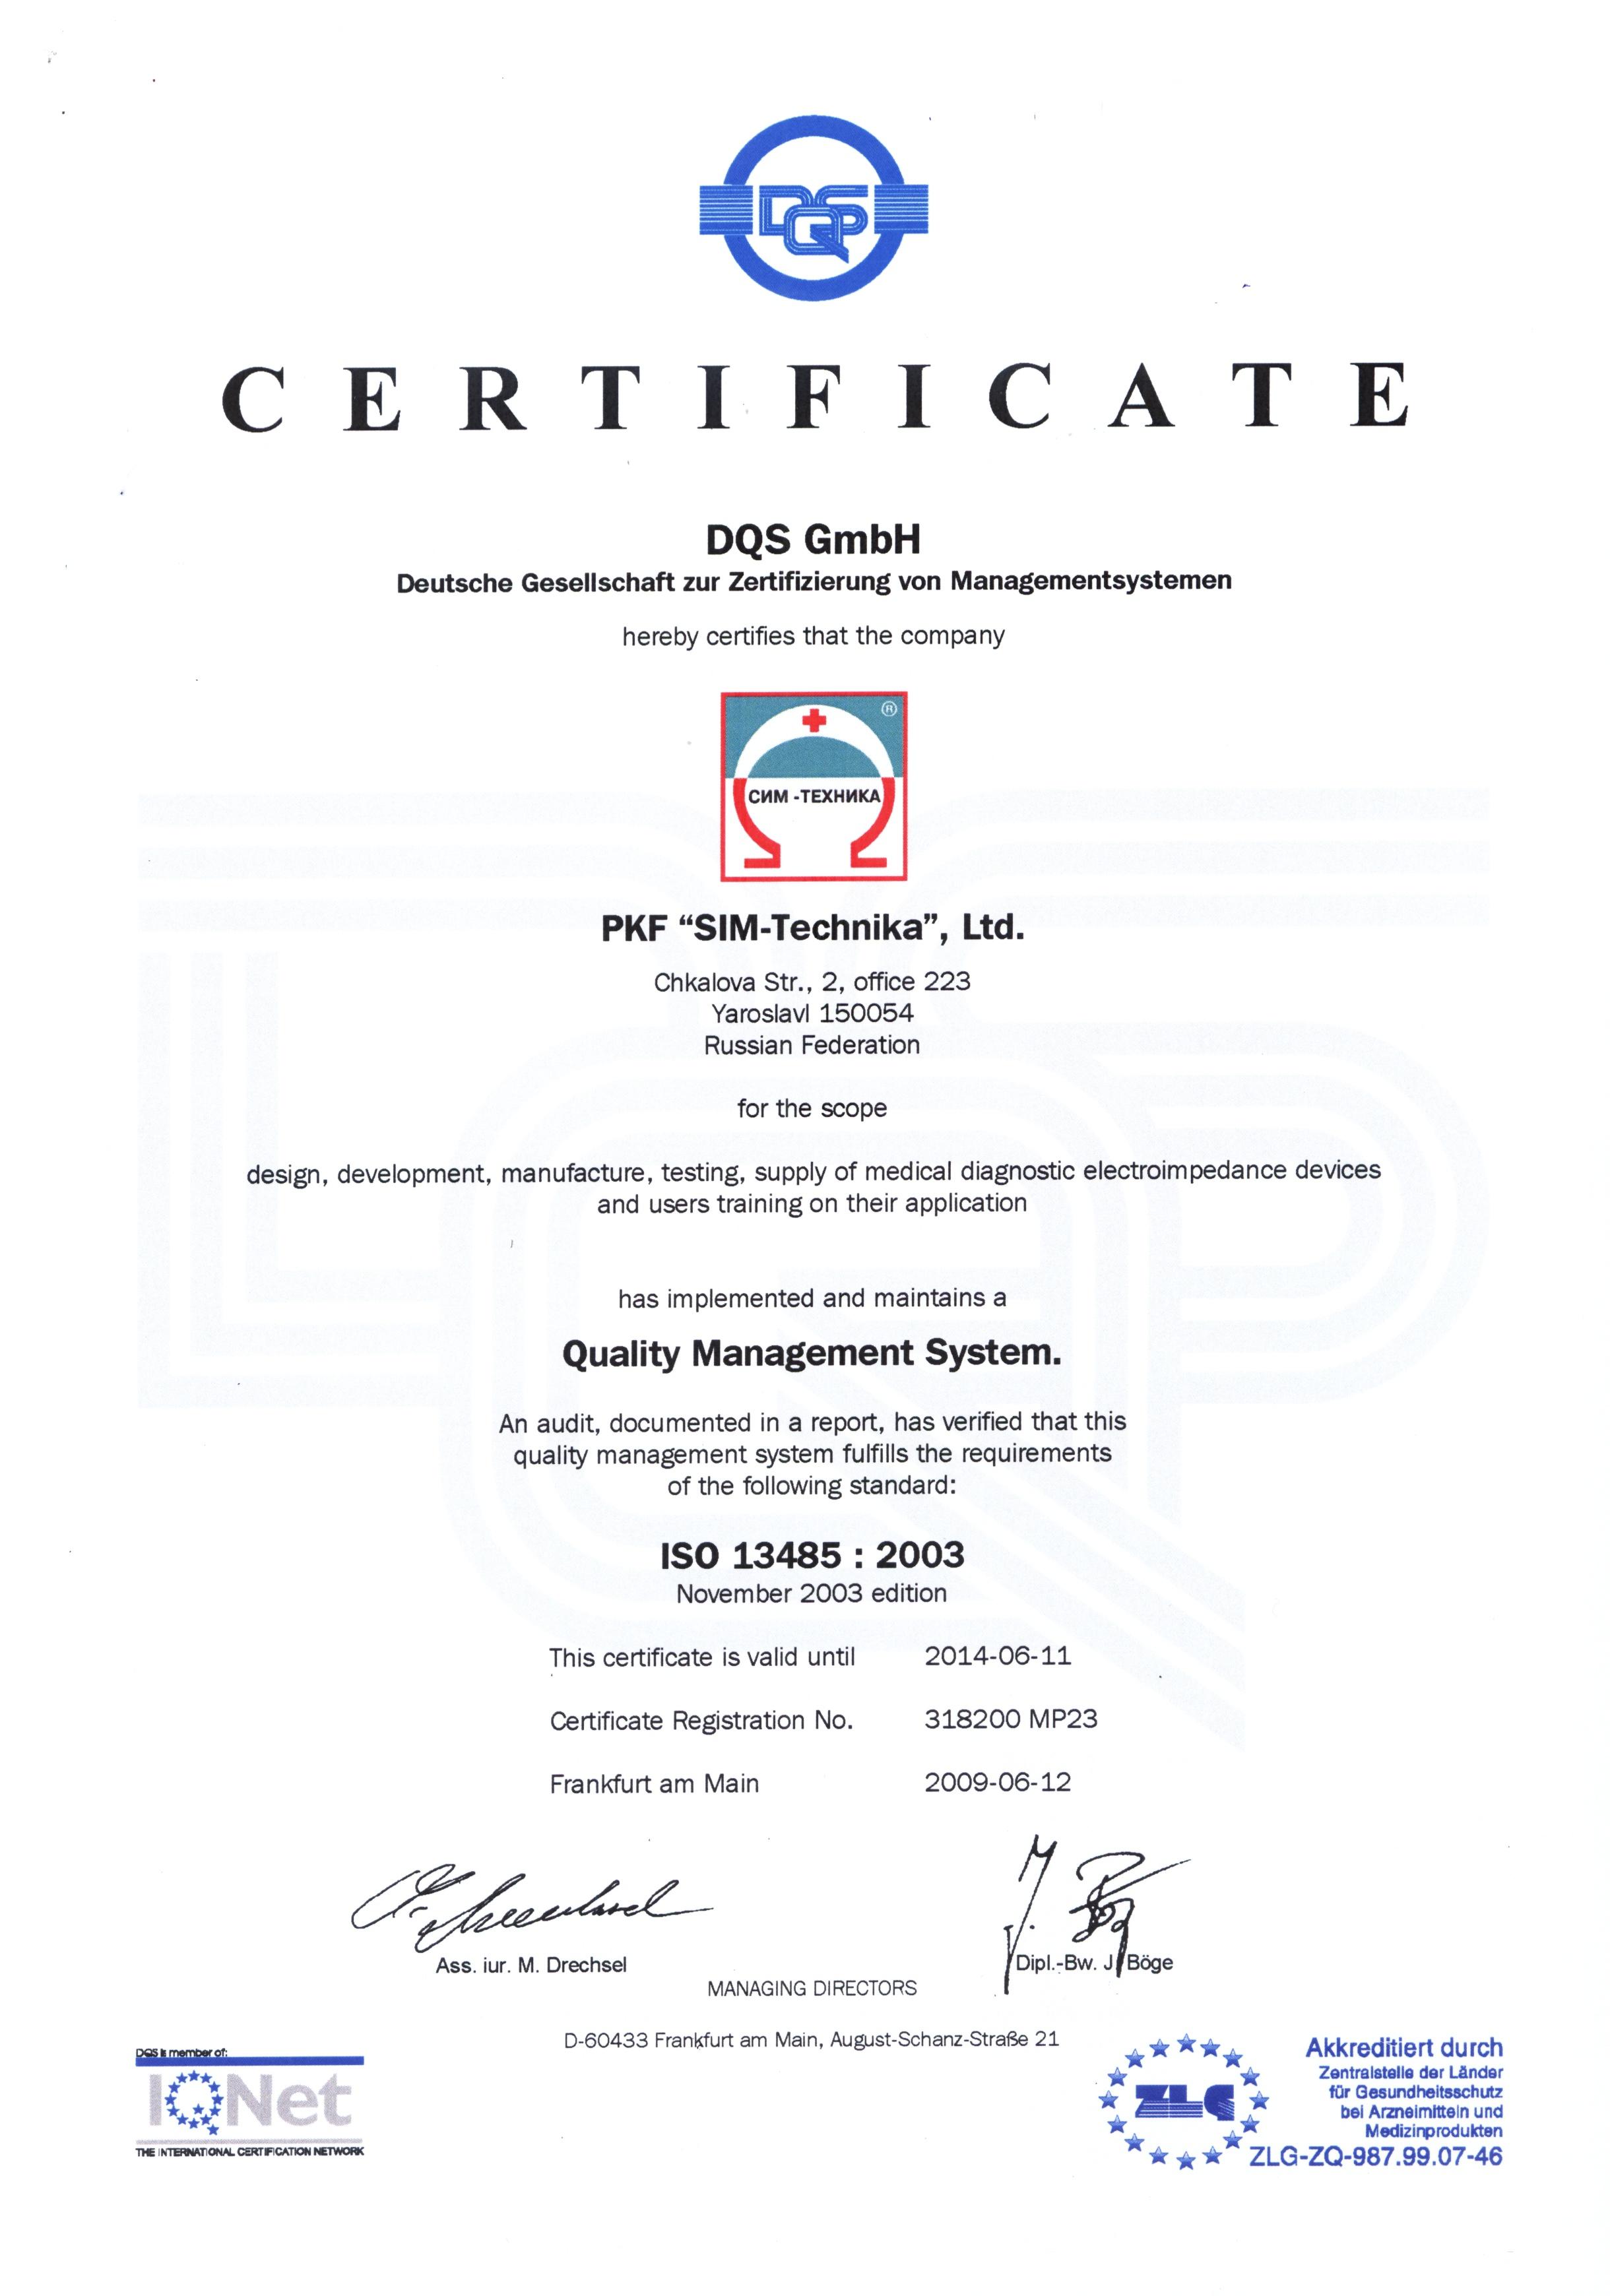 Mobecomm health knowledgebase iso13485 certificate xflitez Gallery